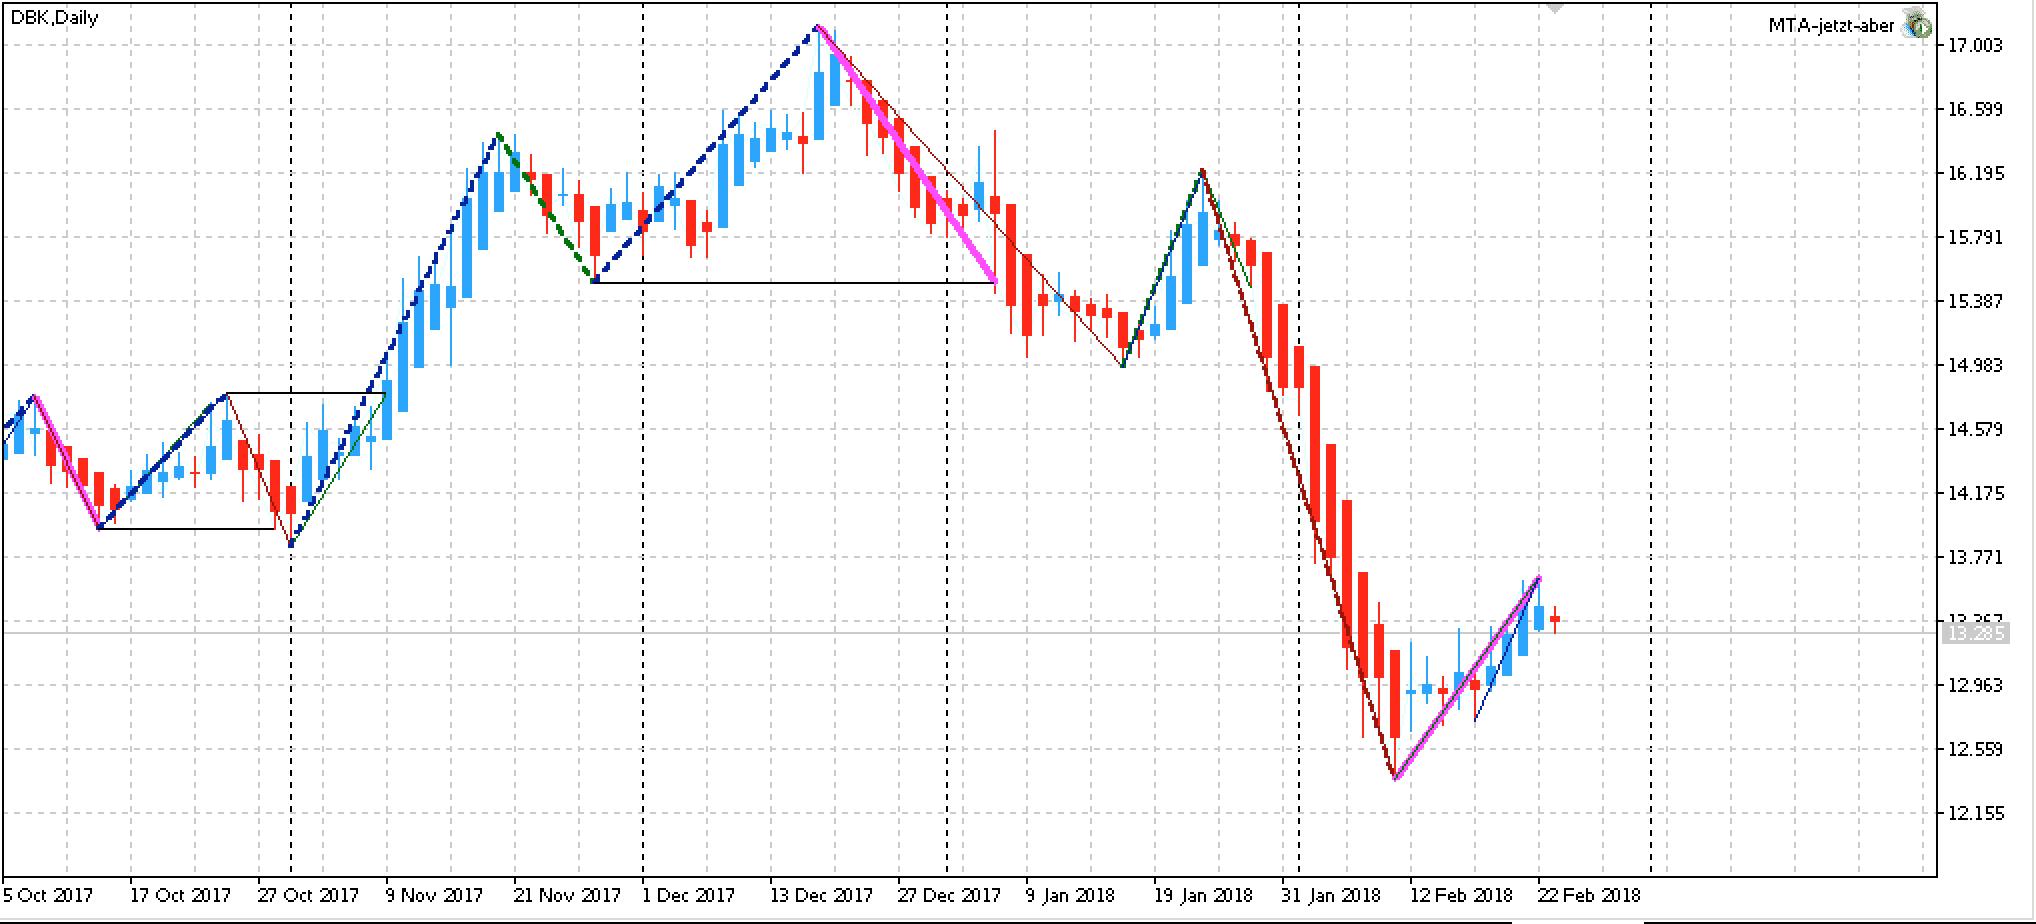 Top Edge-Aktie Deutsche Bank AG: Trendrichtung Short